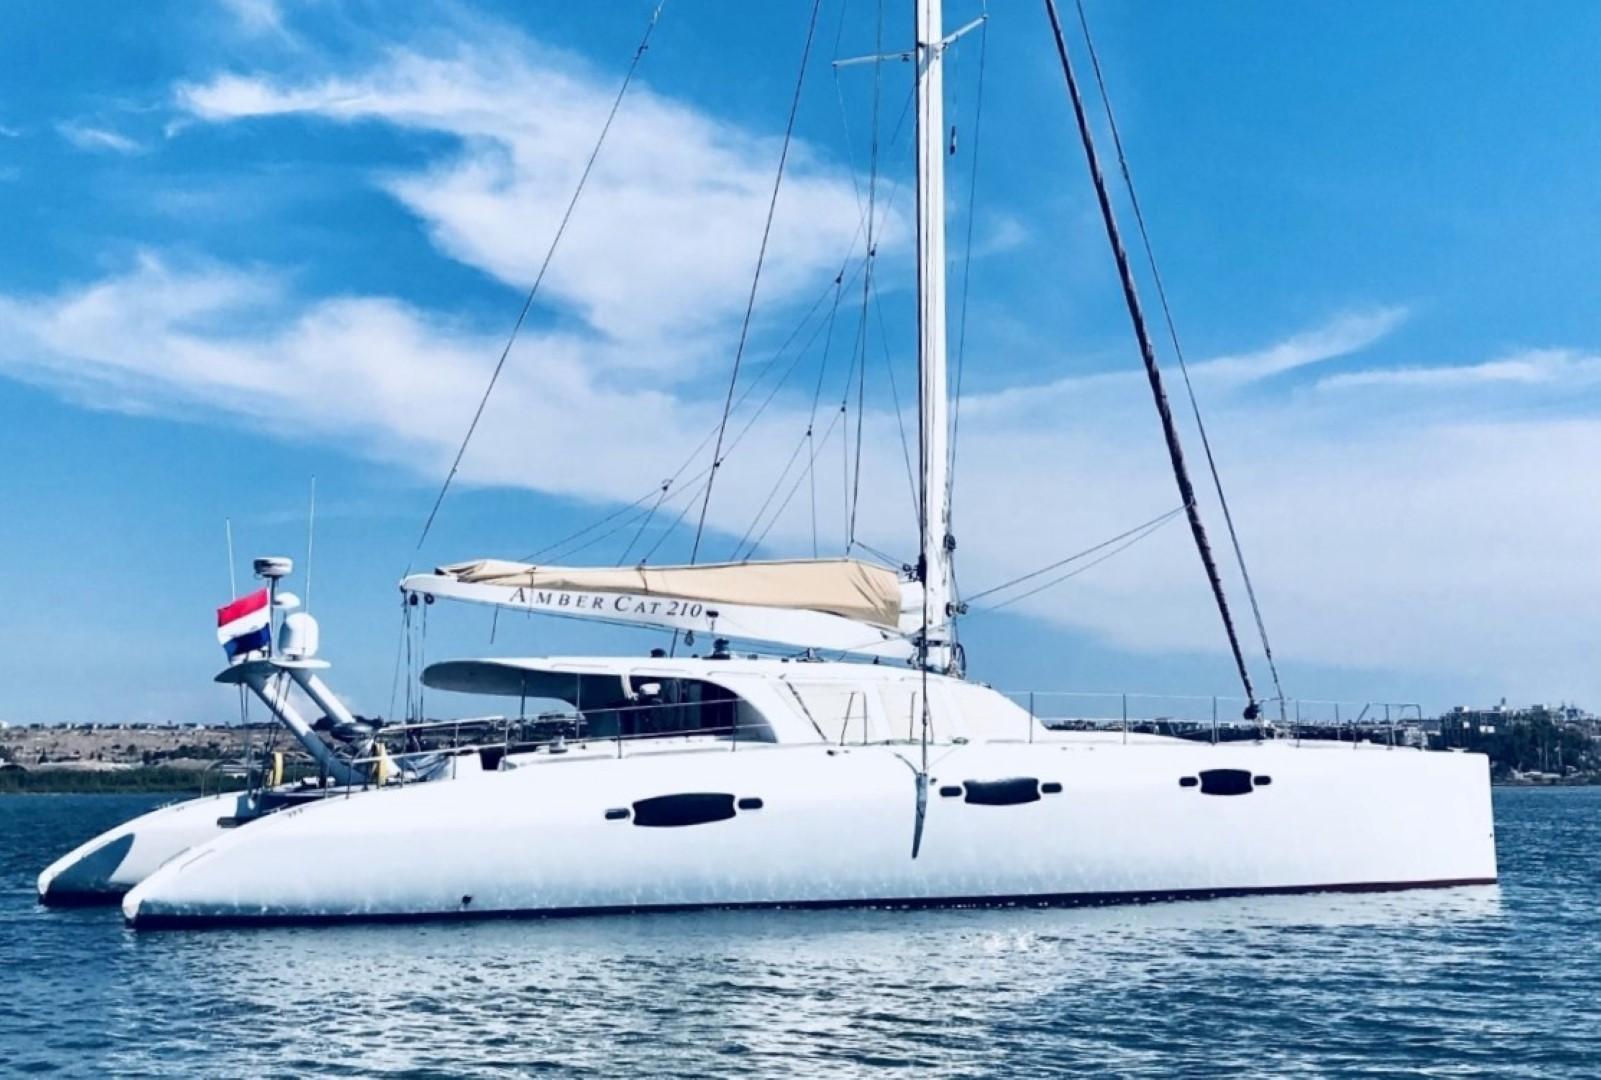 2009 catamaran enmar ambercat 210 [ 1601 x 1080 Pixel ]